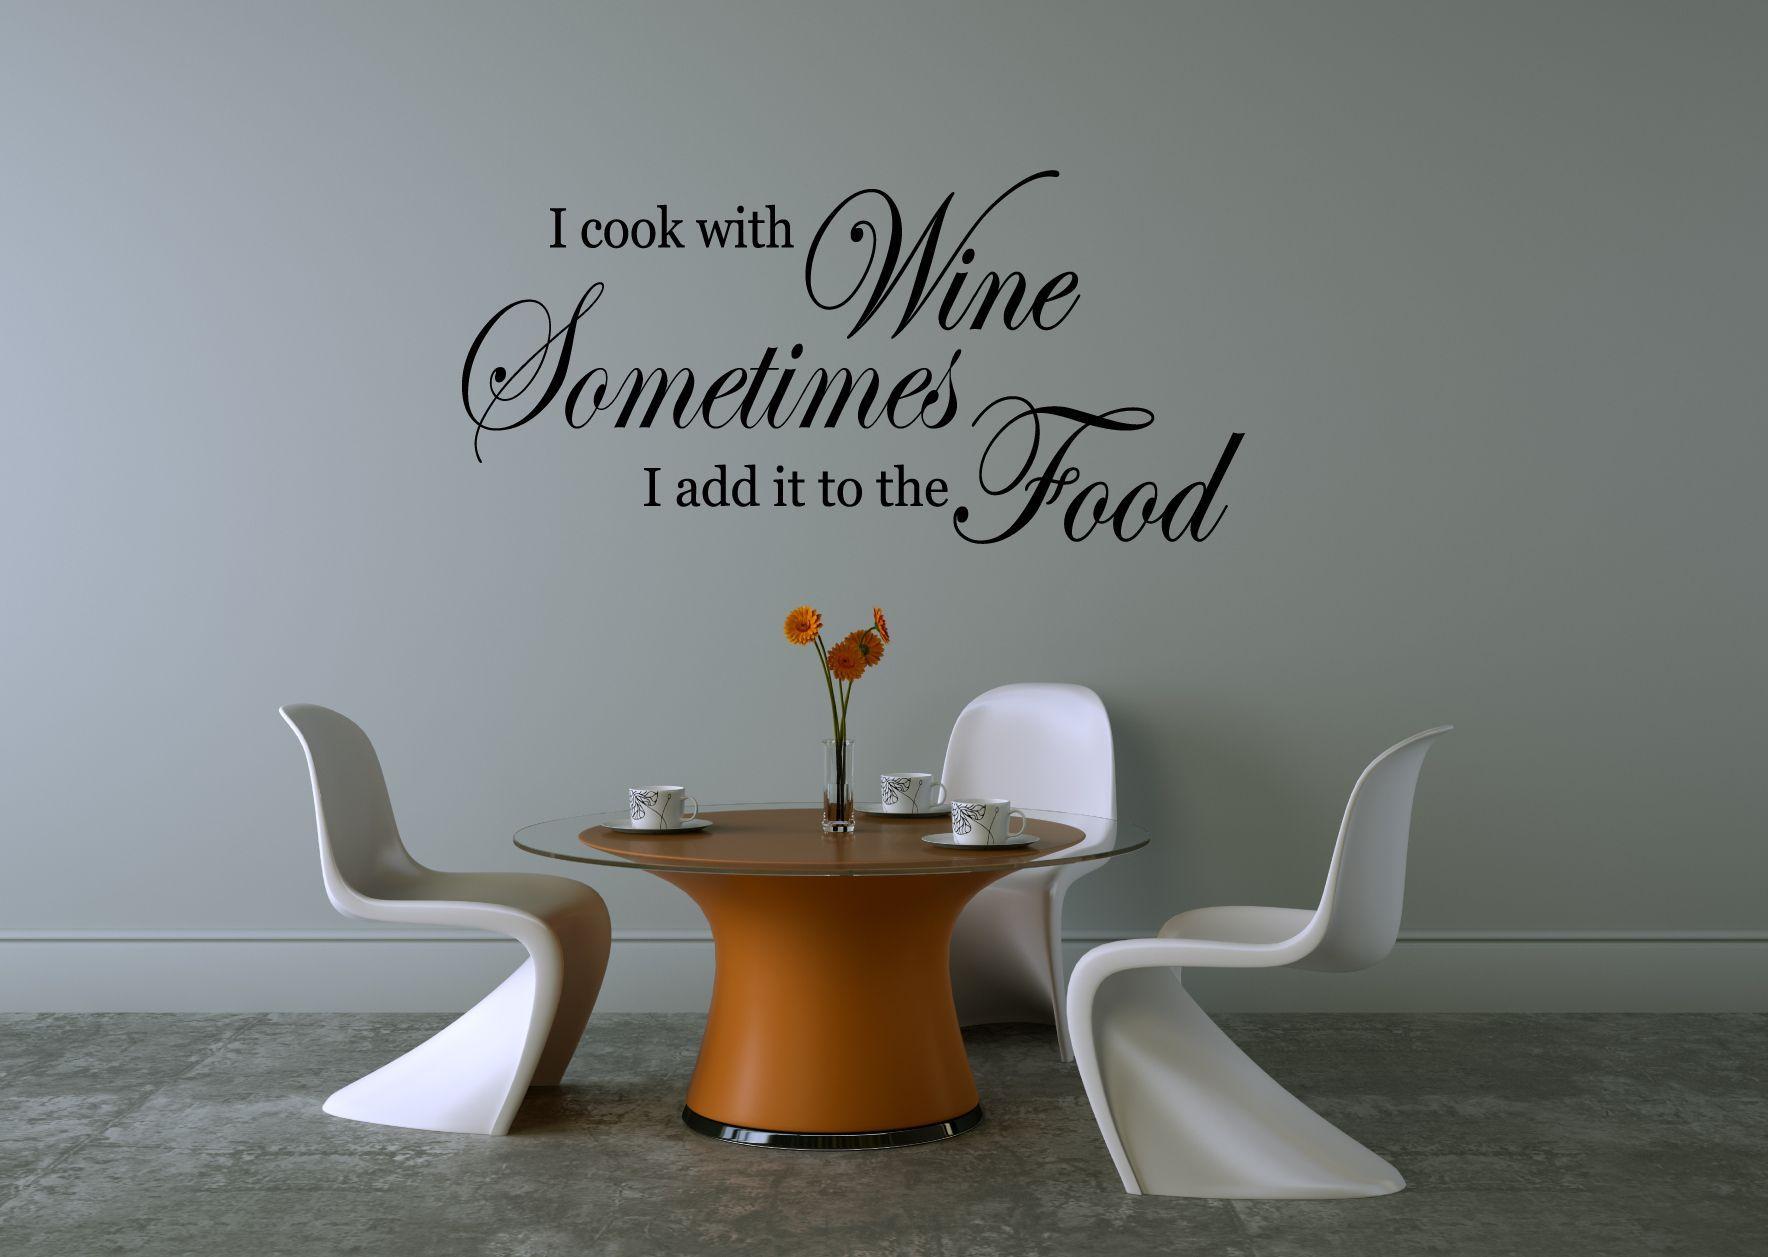 sayings wall decals | italian kitchen wall decals ebay ...